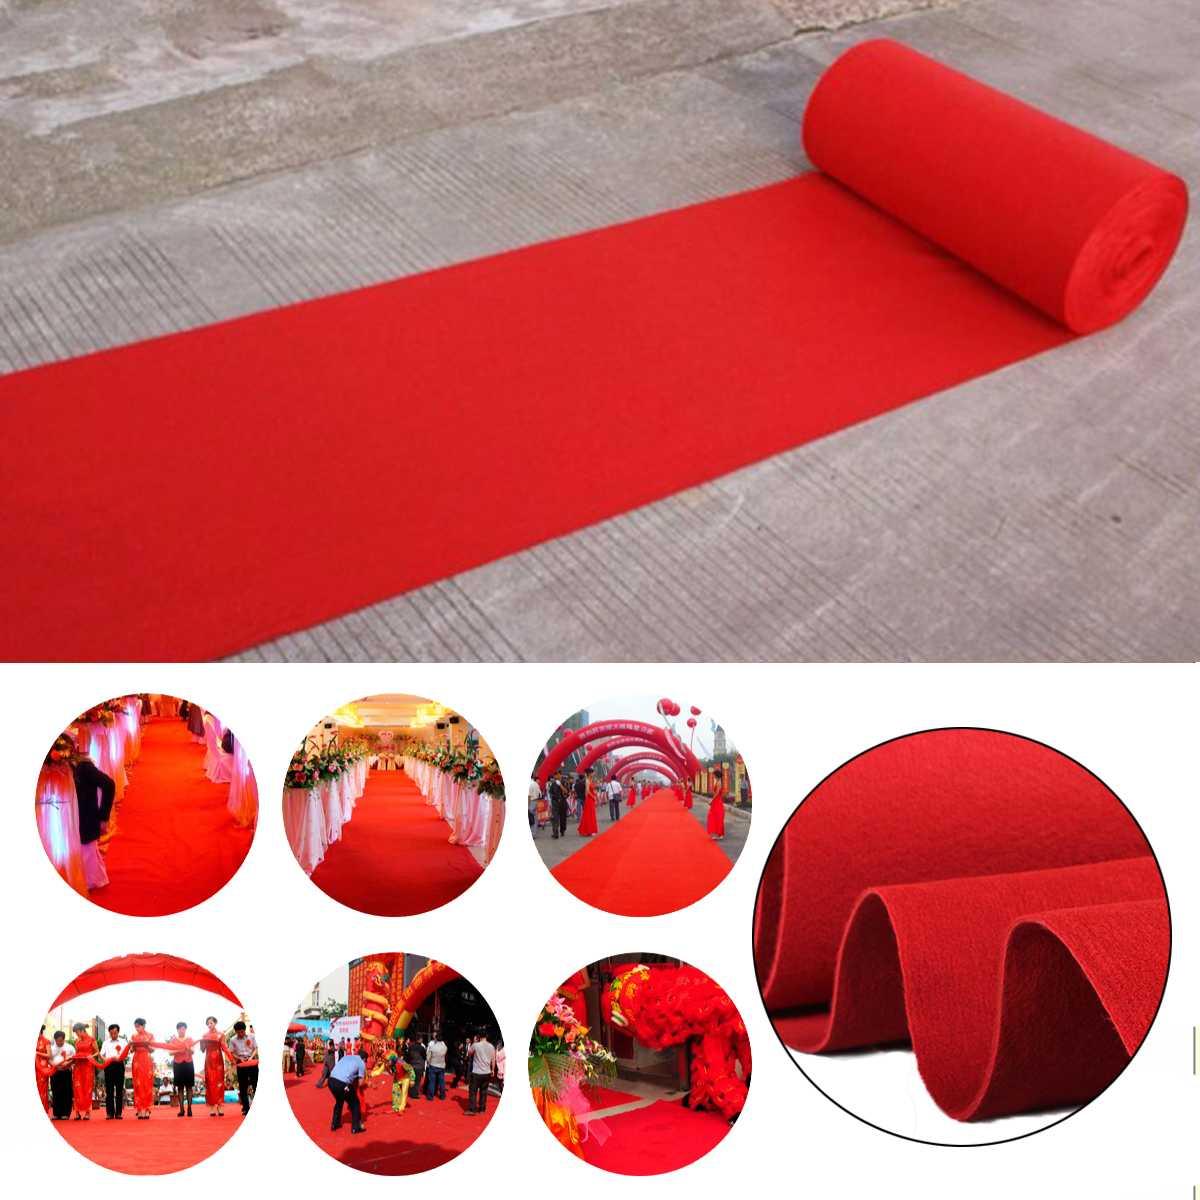 1.5/5/10m Outdoor Red Carpet Mats Aisle For Wedding Banquet Film Festivals Parties Celebrations Awards Events Decoration Carpet